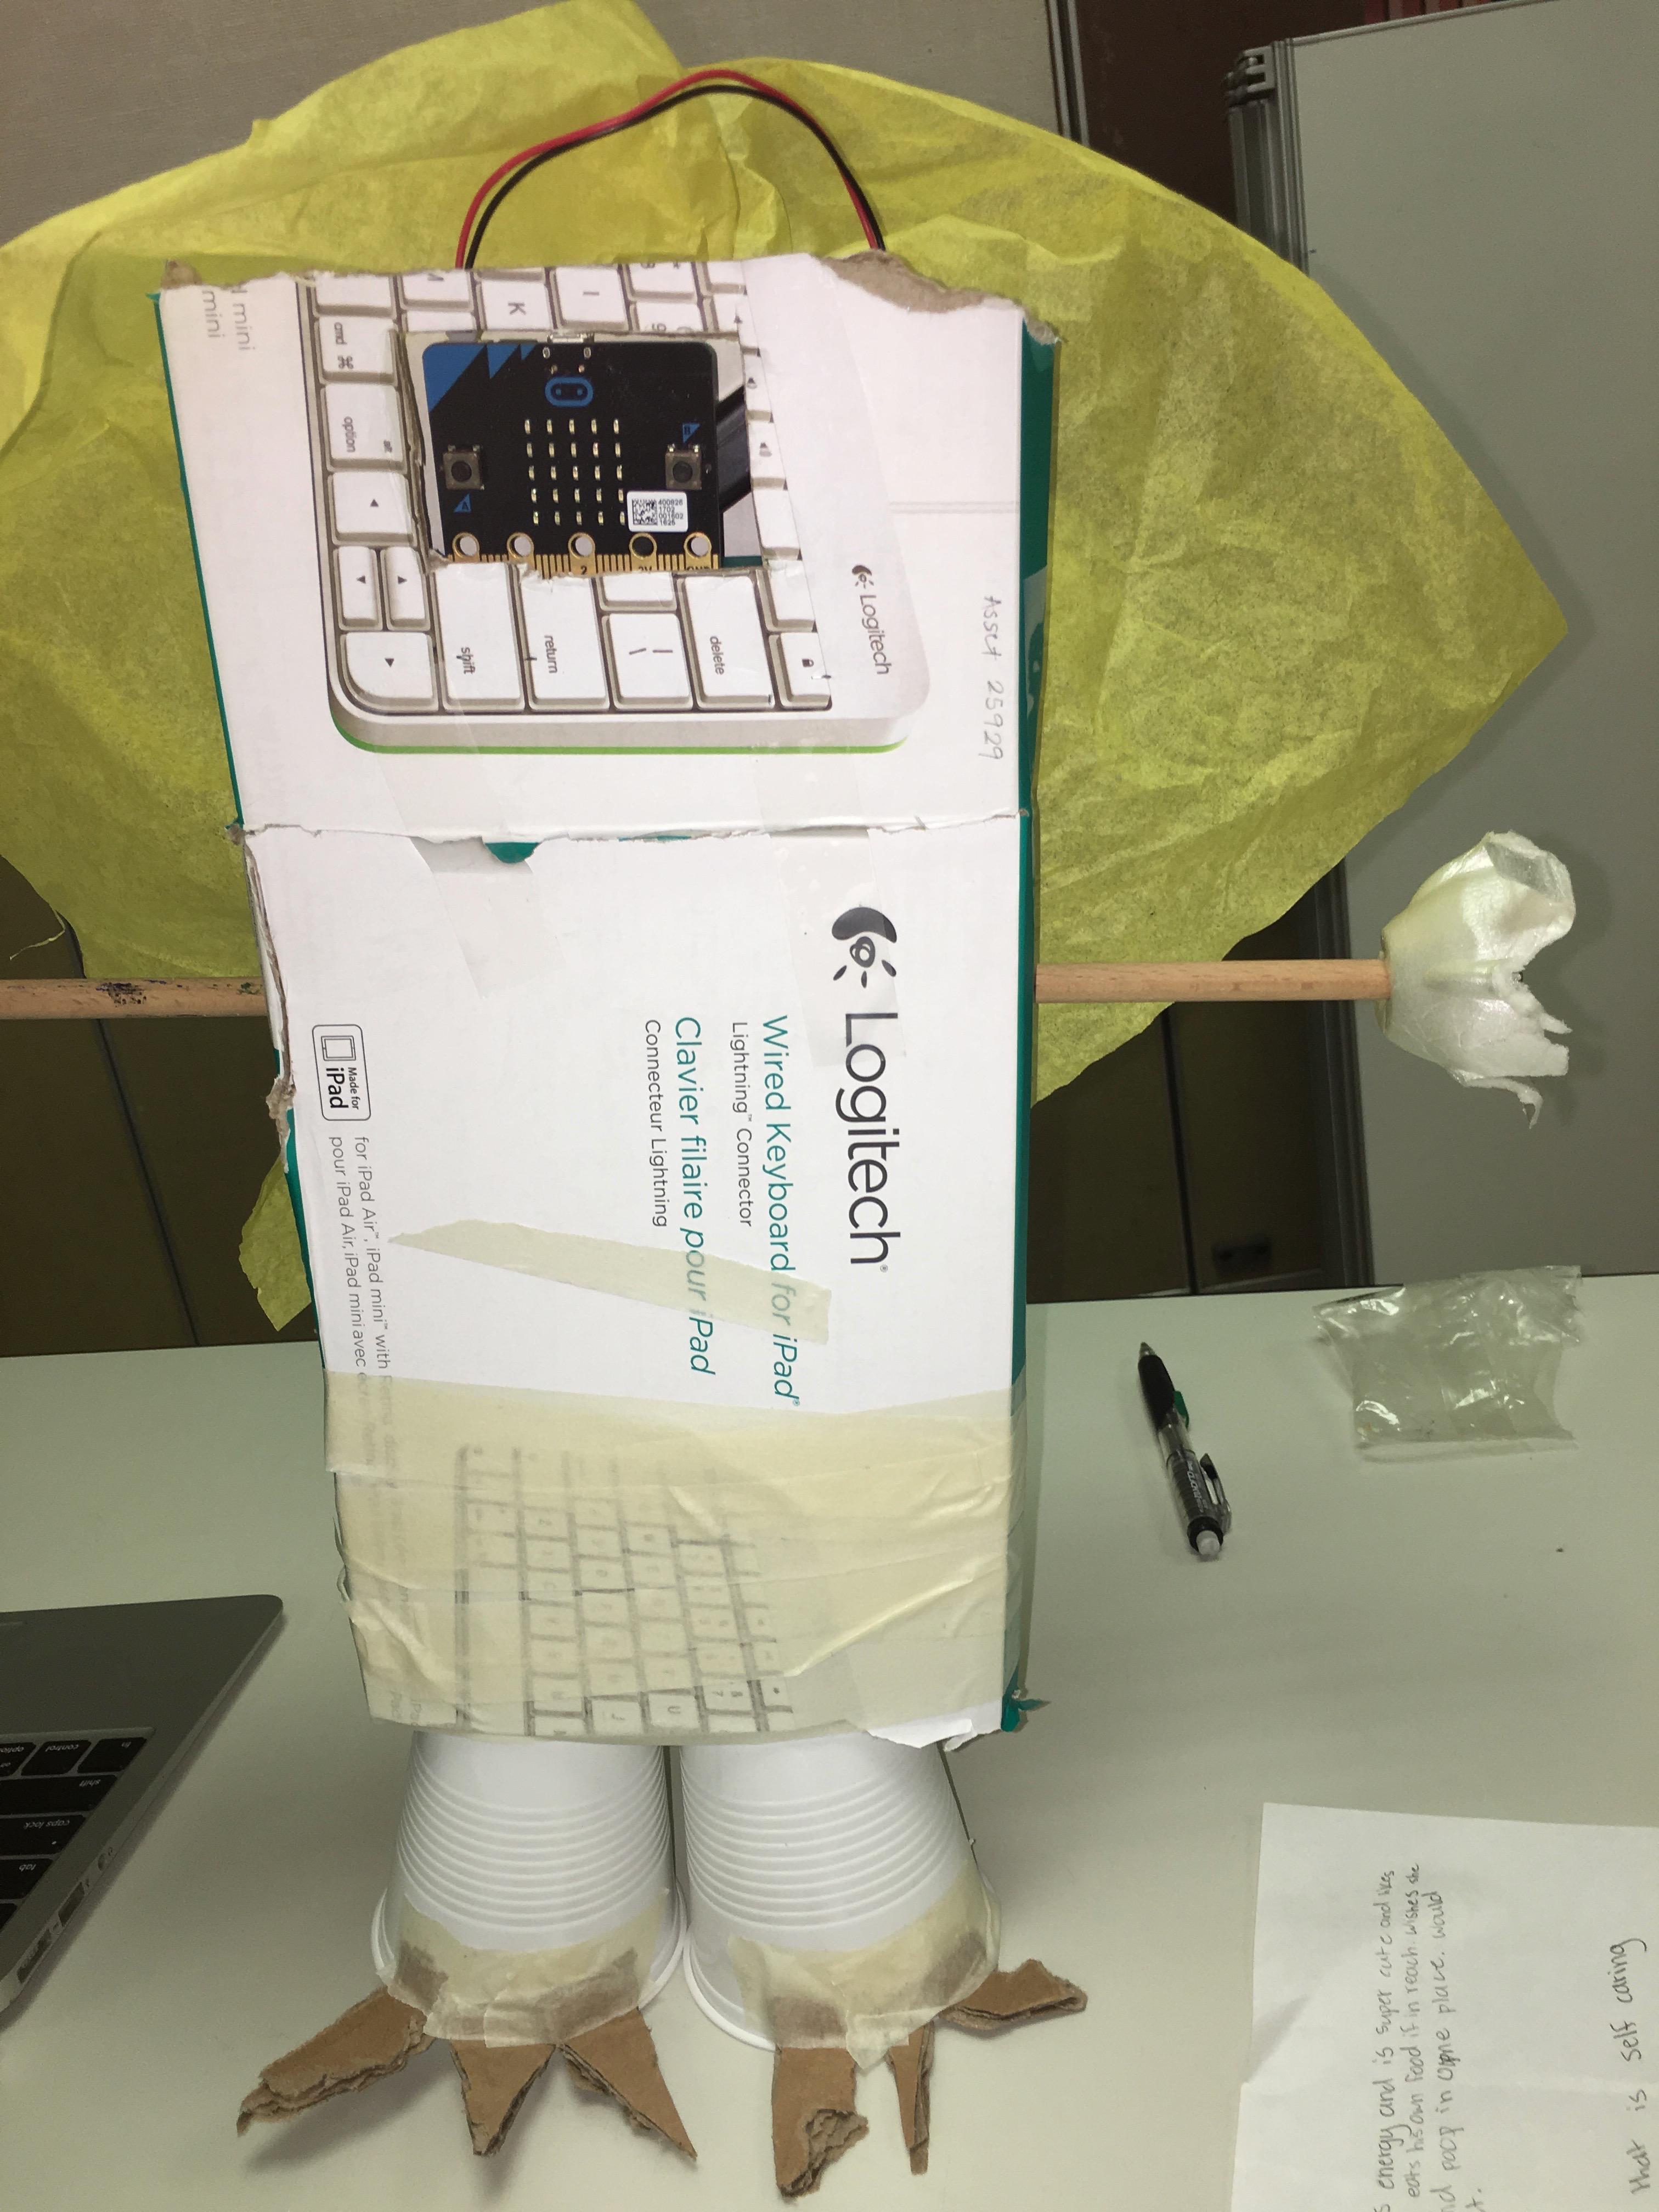 A robot micro:pet